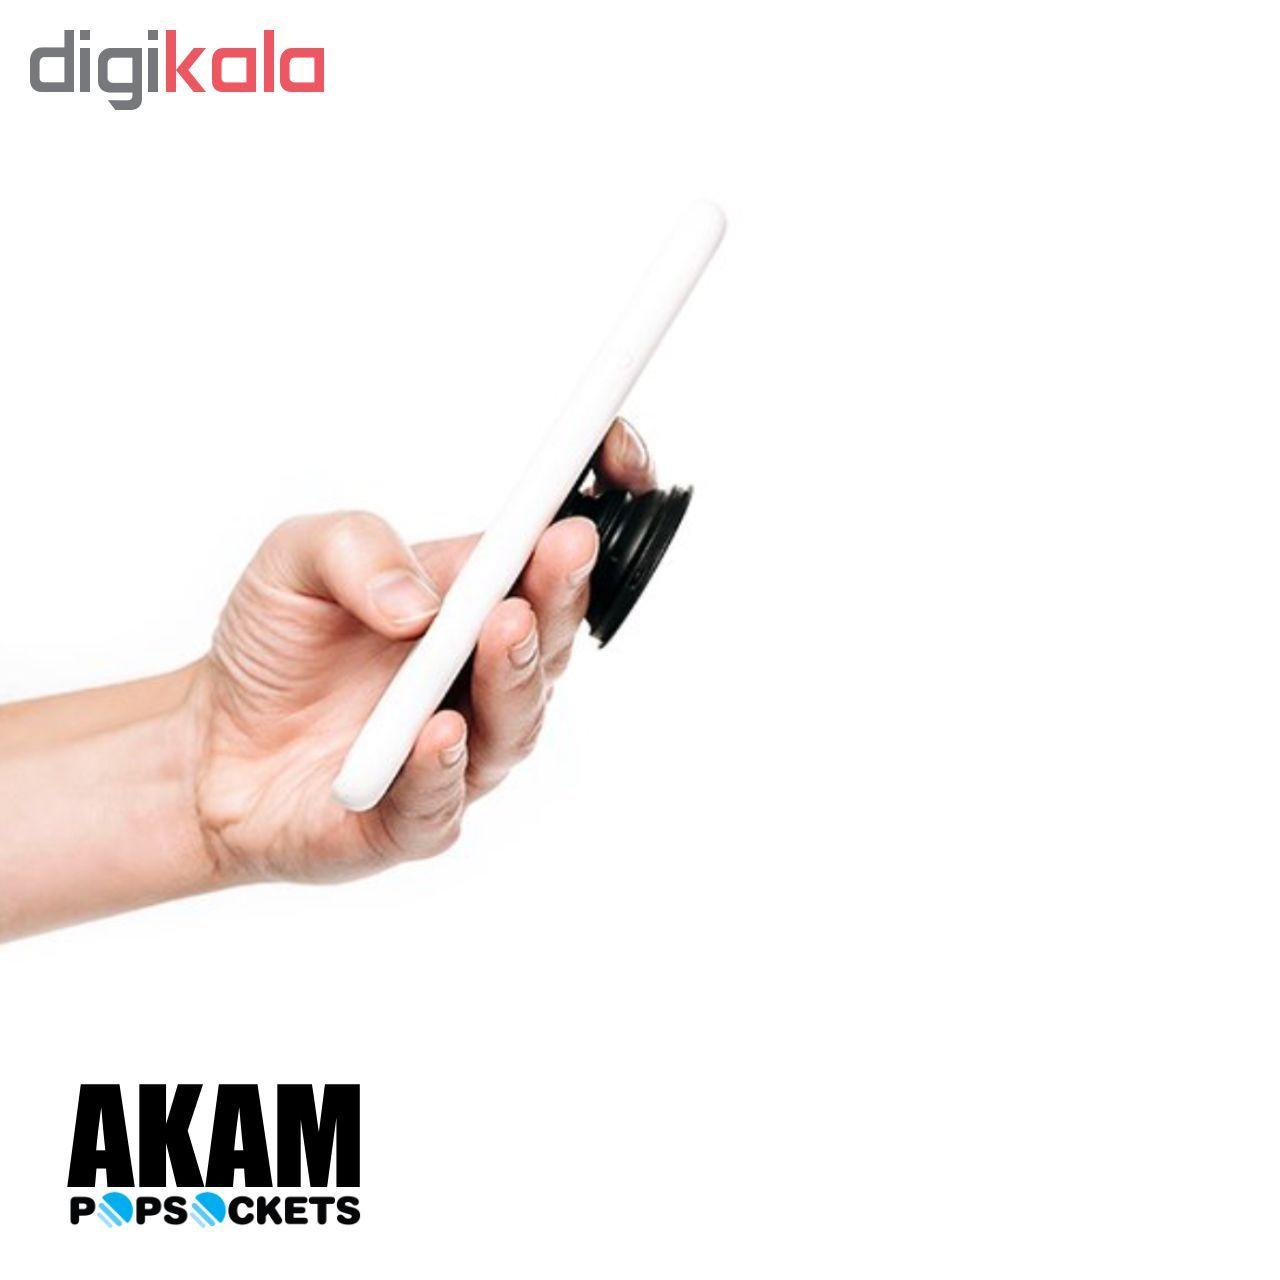 پایه نگهدارنده گوشی موبایل پاپ سوکت آکام مدل APS0058 main 1 9